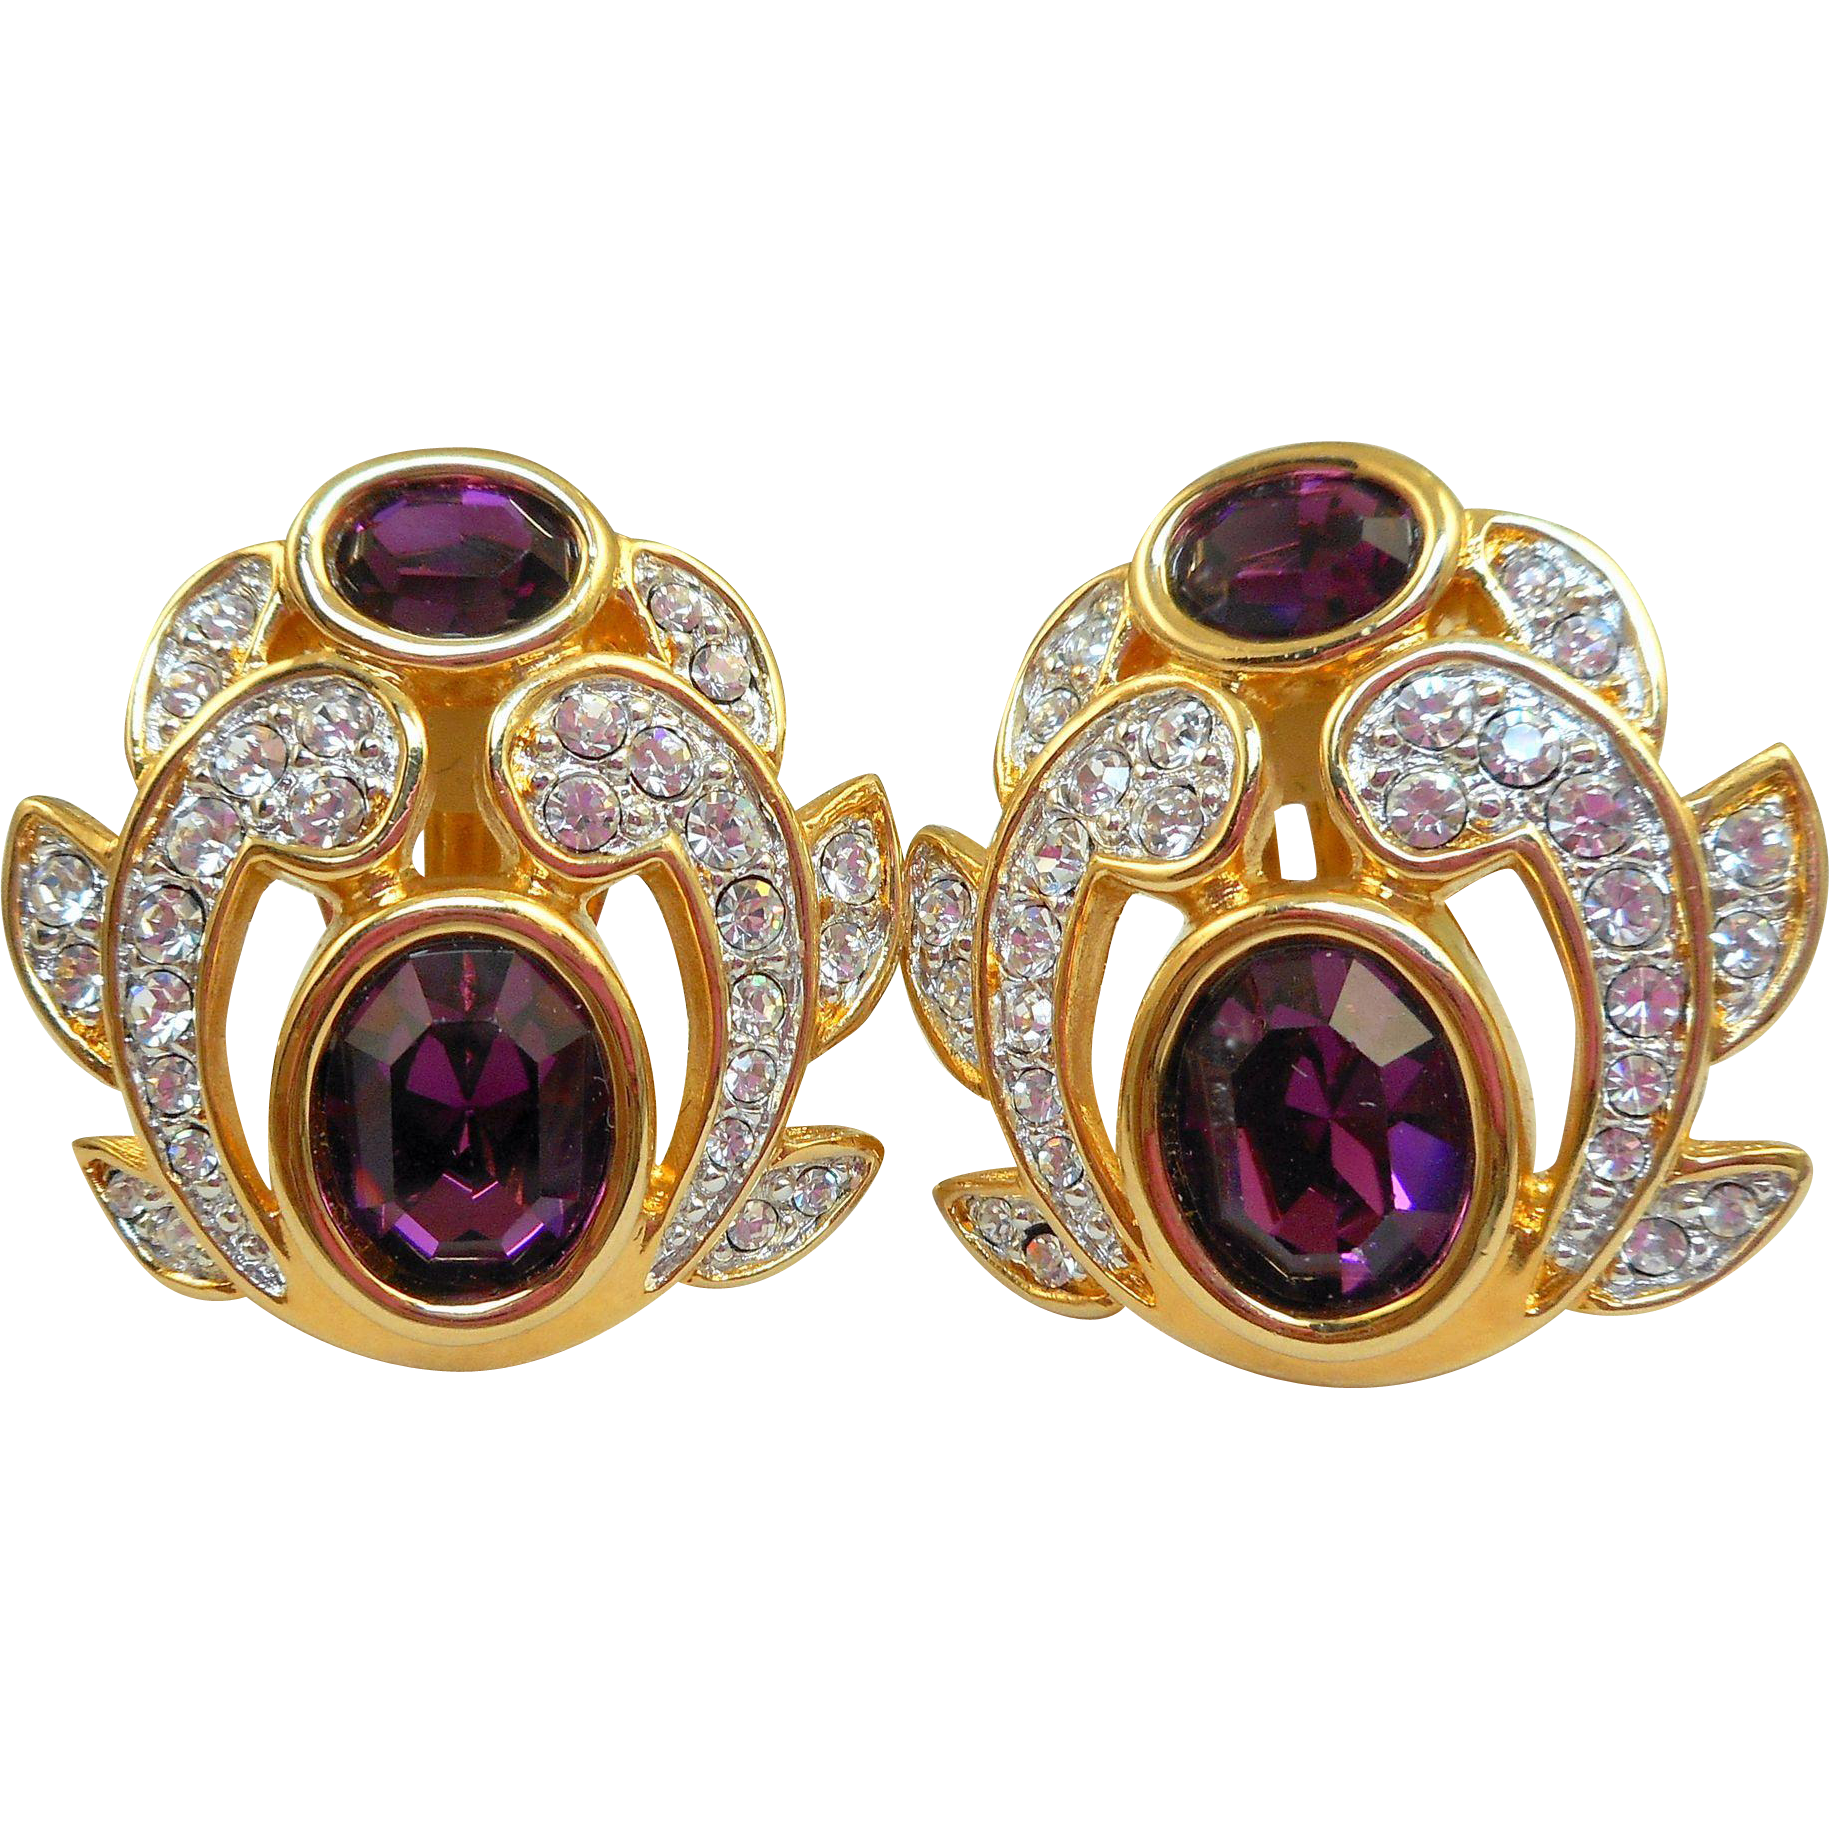 NOS Swarovski Purple Rhinestone Earrings - MOC